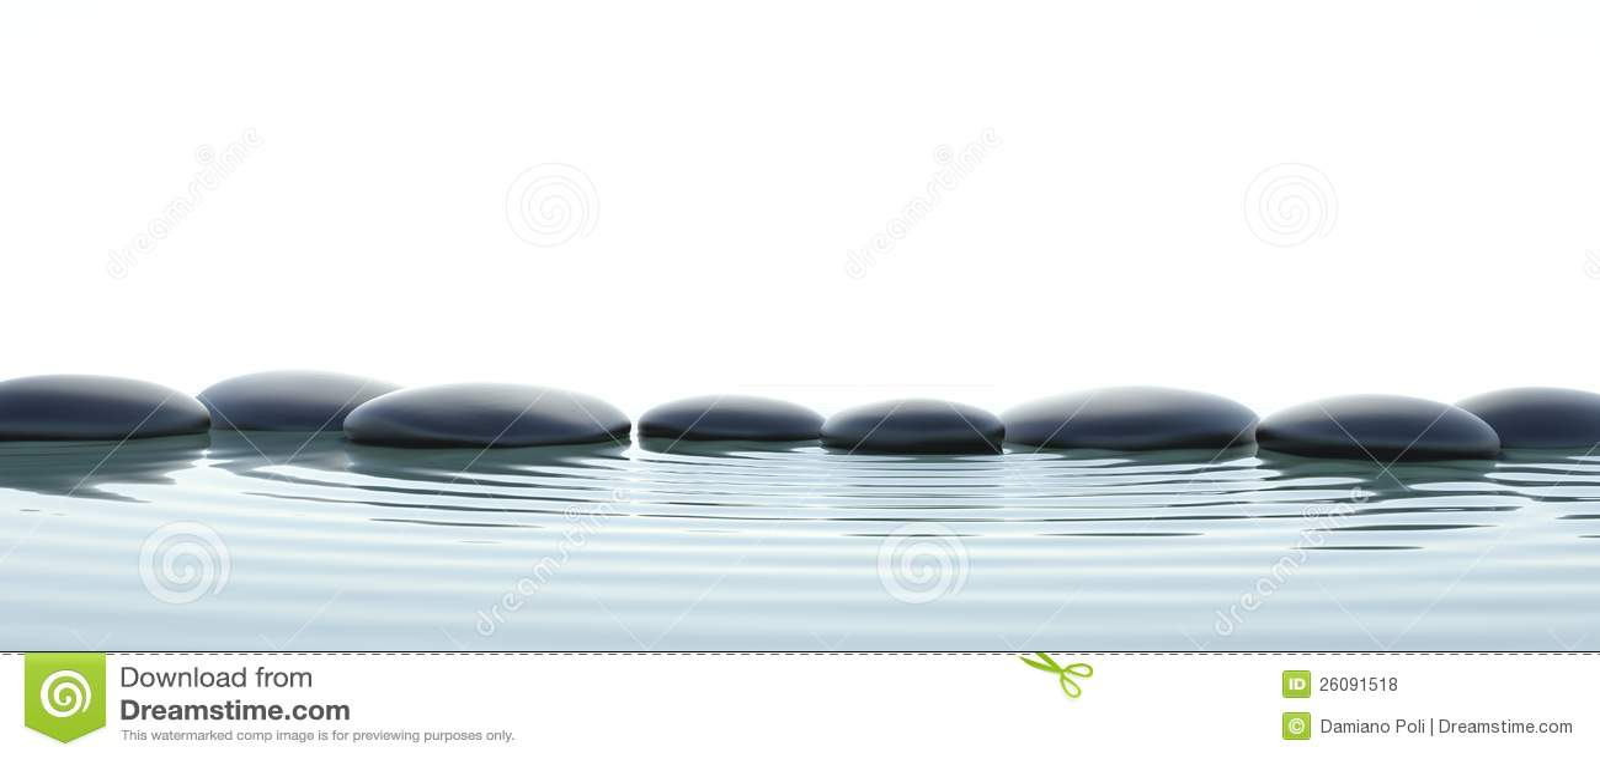 Камни Дзэн в воде на широкоэкранном